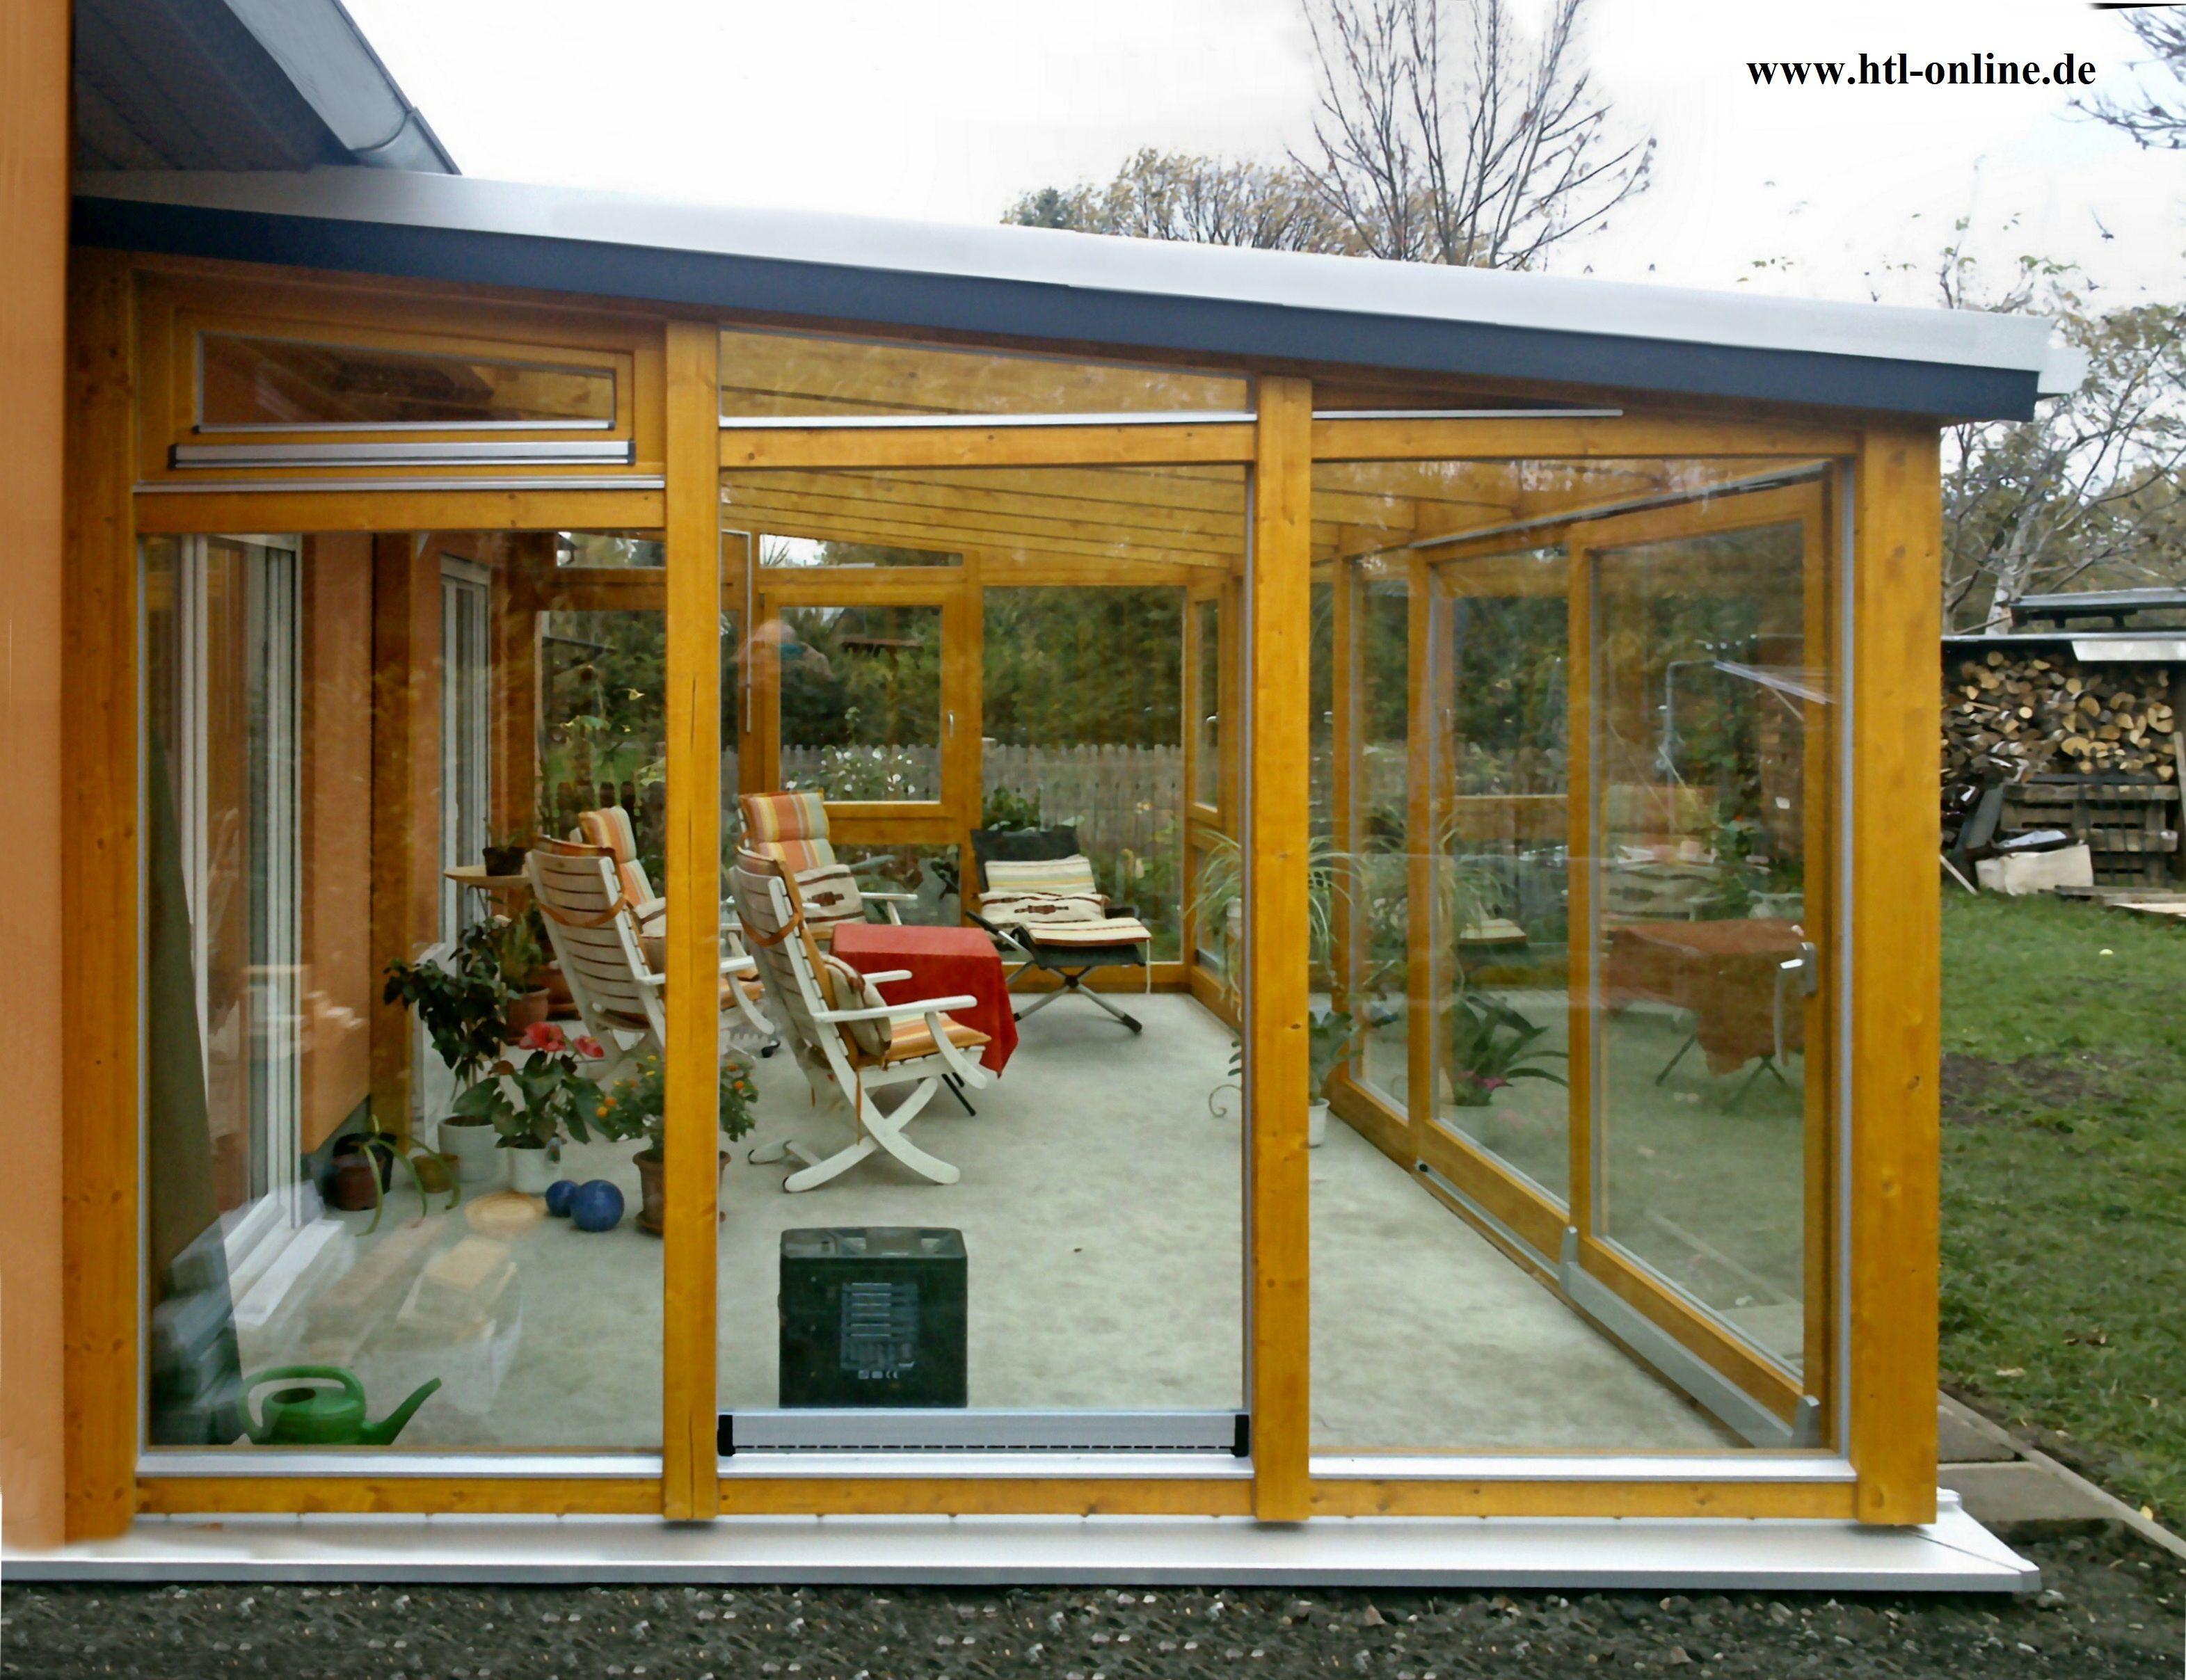 wintergarten aus holz htl holztechnik holz arbeit mit. Black Bedroom Furniture Sets. Home Design Ideas